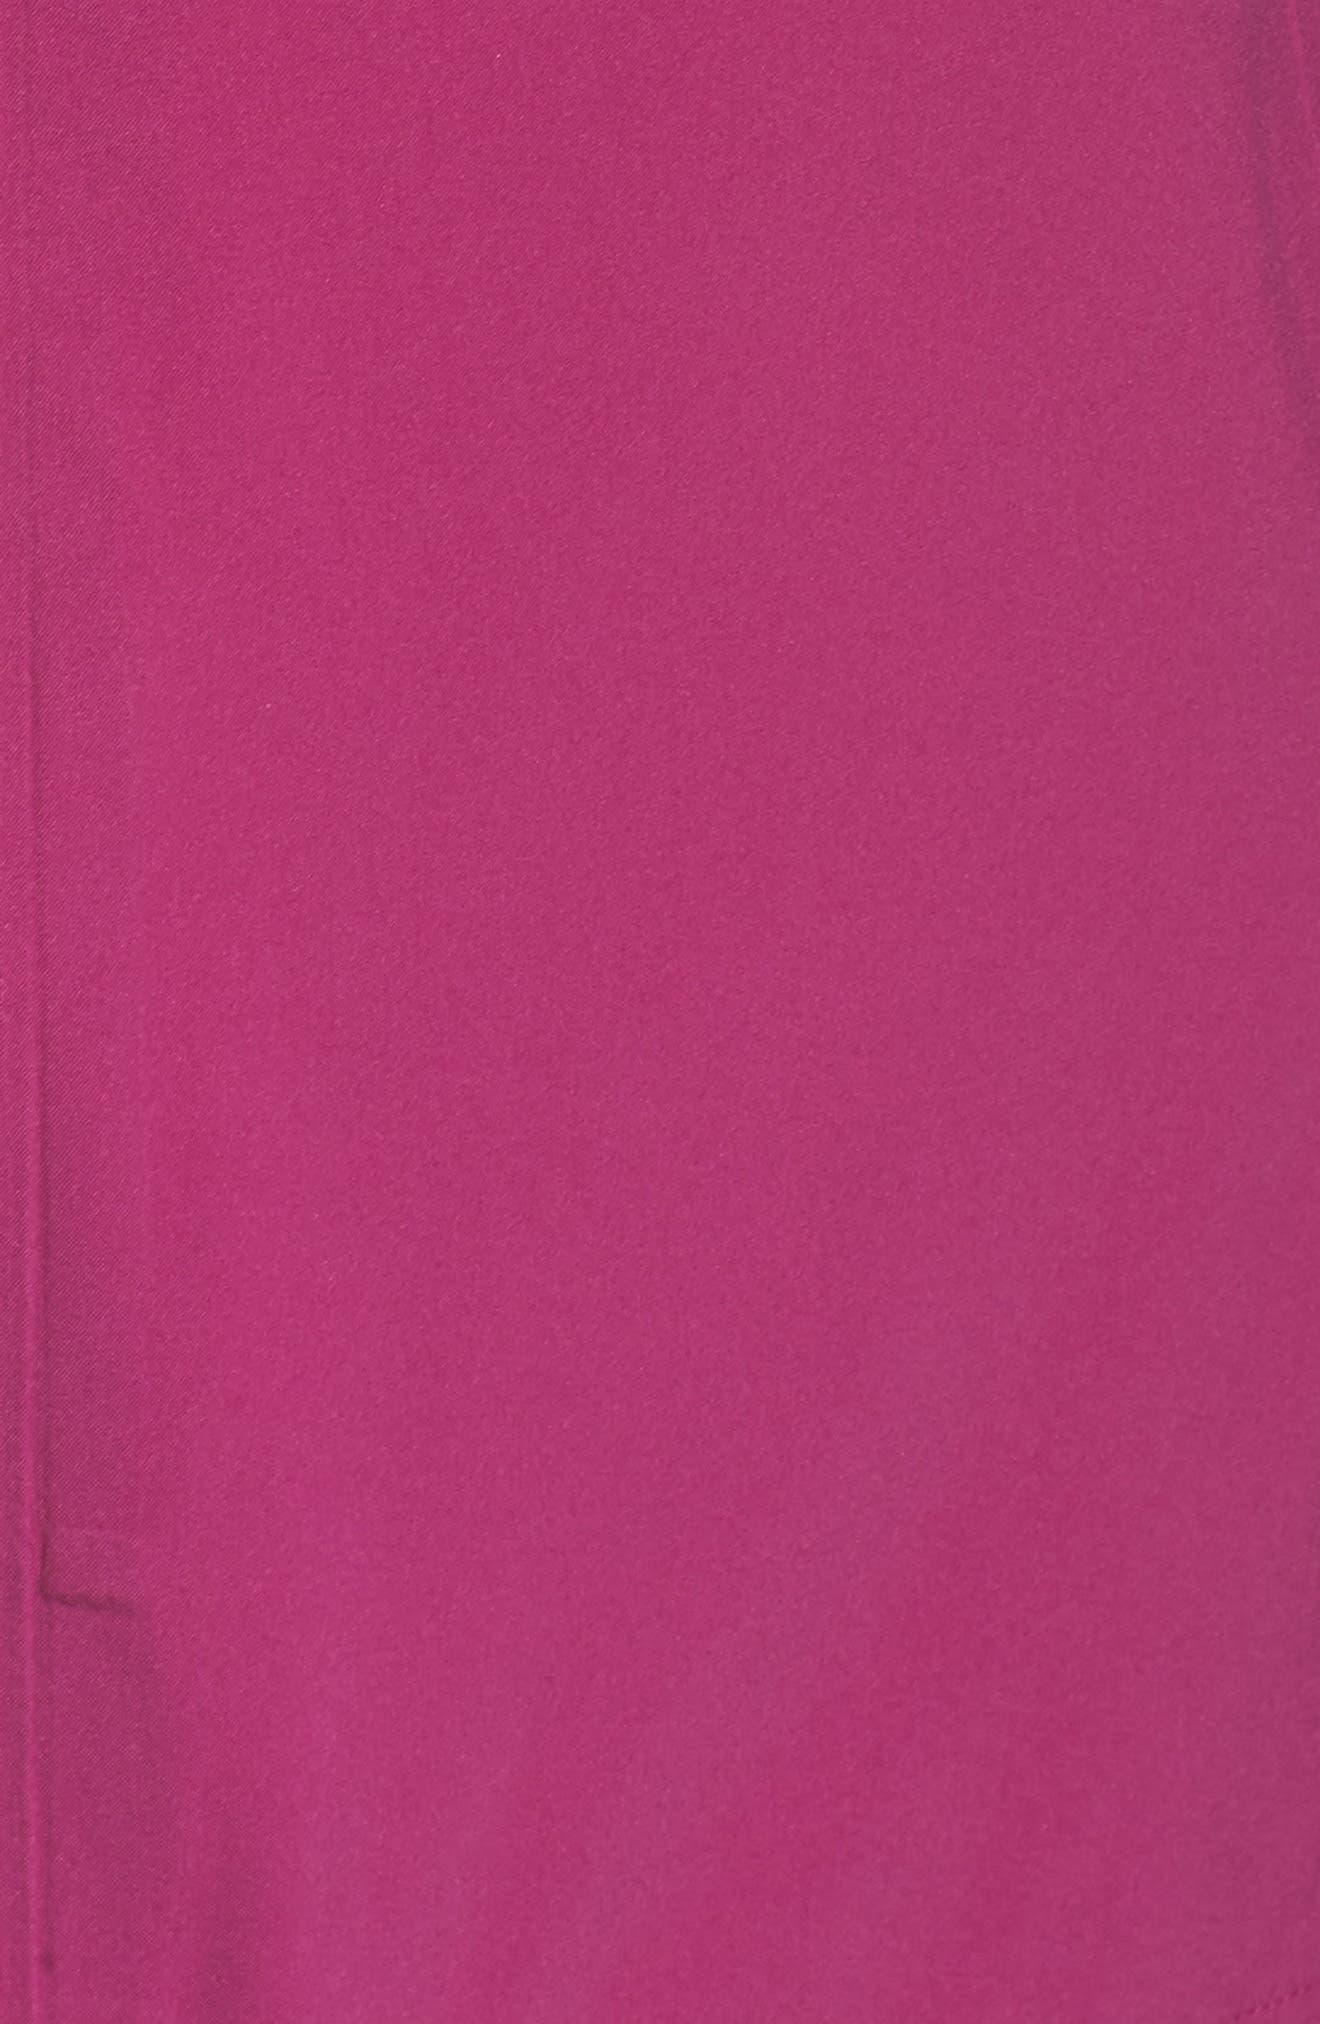 Progressor DV Jacket,                             Alternate thumbnail 6, color,                             Wild Aster Purple/ Galaxy